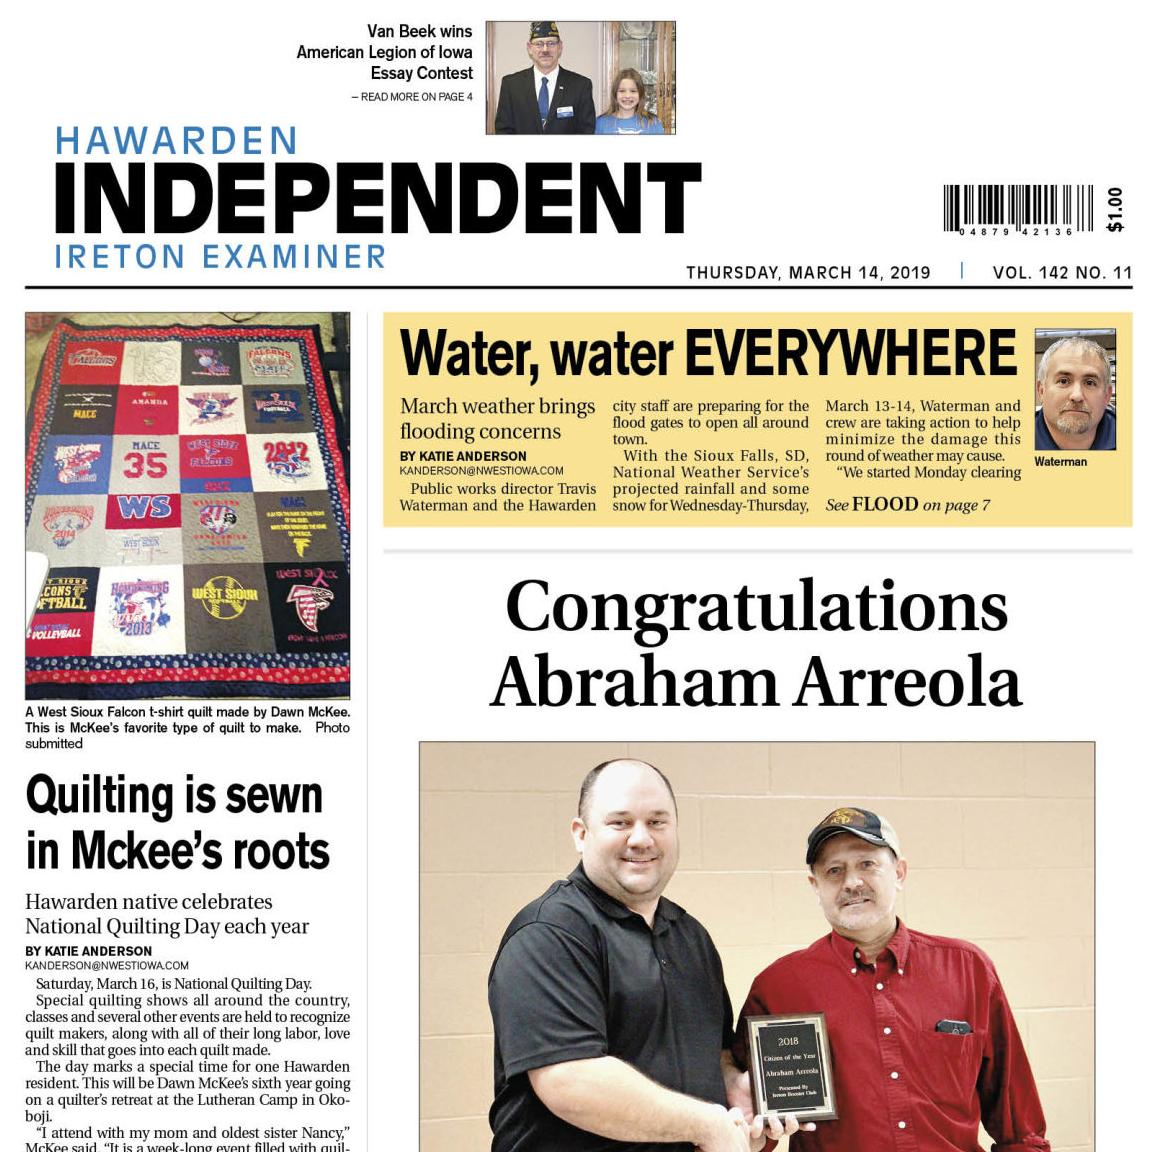 Hawarden Independent/Ireton Examiner March 14, 2019